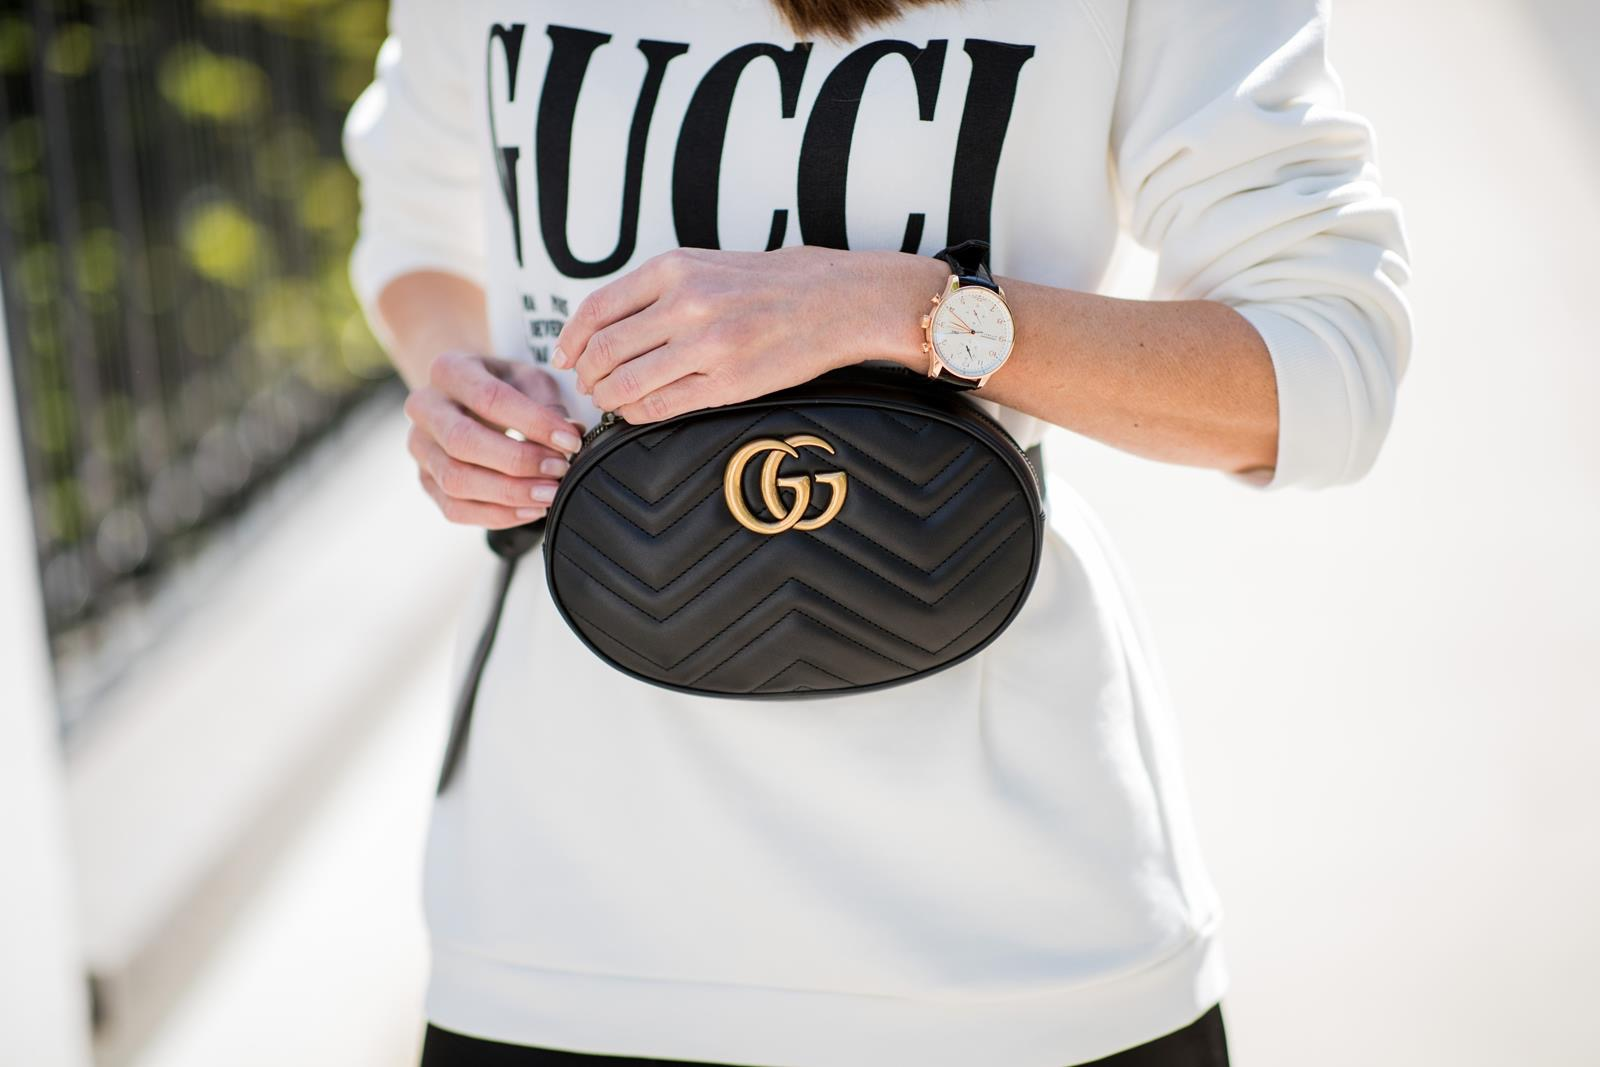 bfbbaf223822 ... Alexandra Lapp wearing a Gucci Belt Bag Look with a white crew-neck  cotton sweatshirt ...